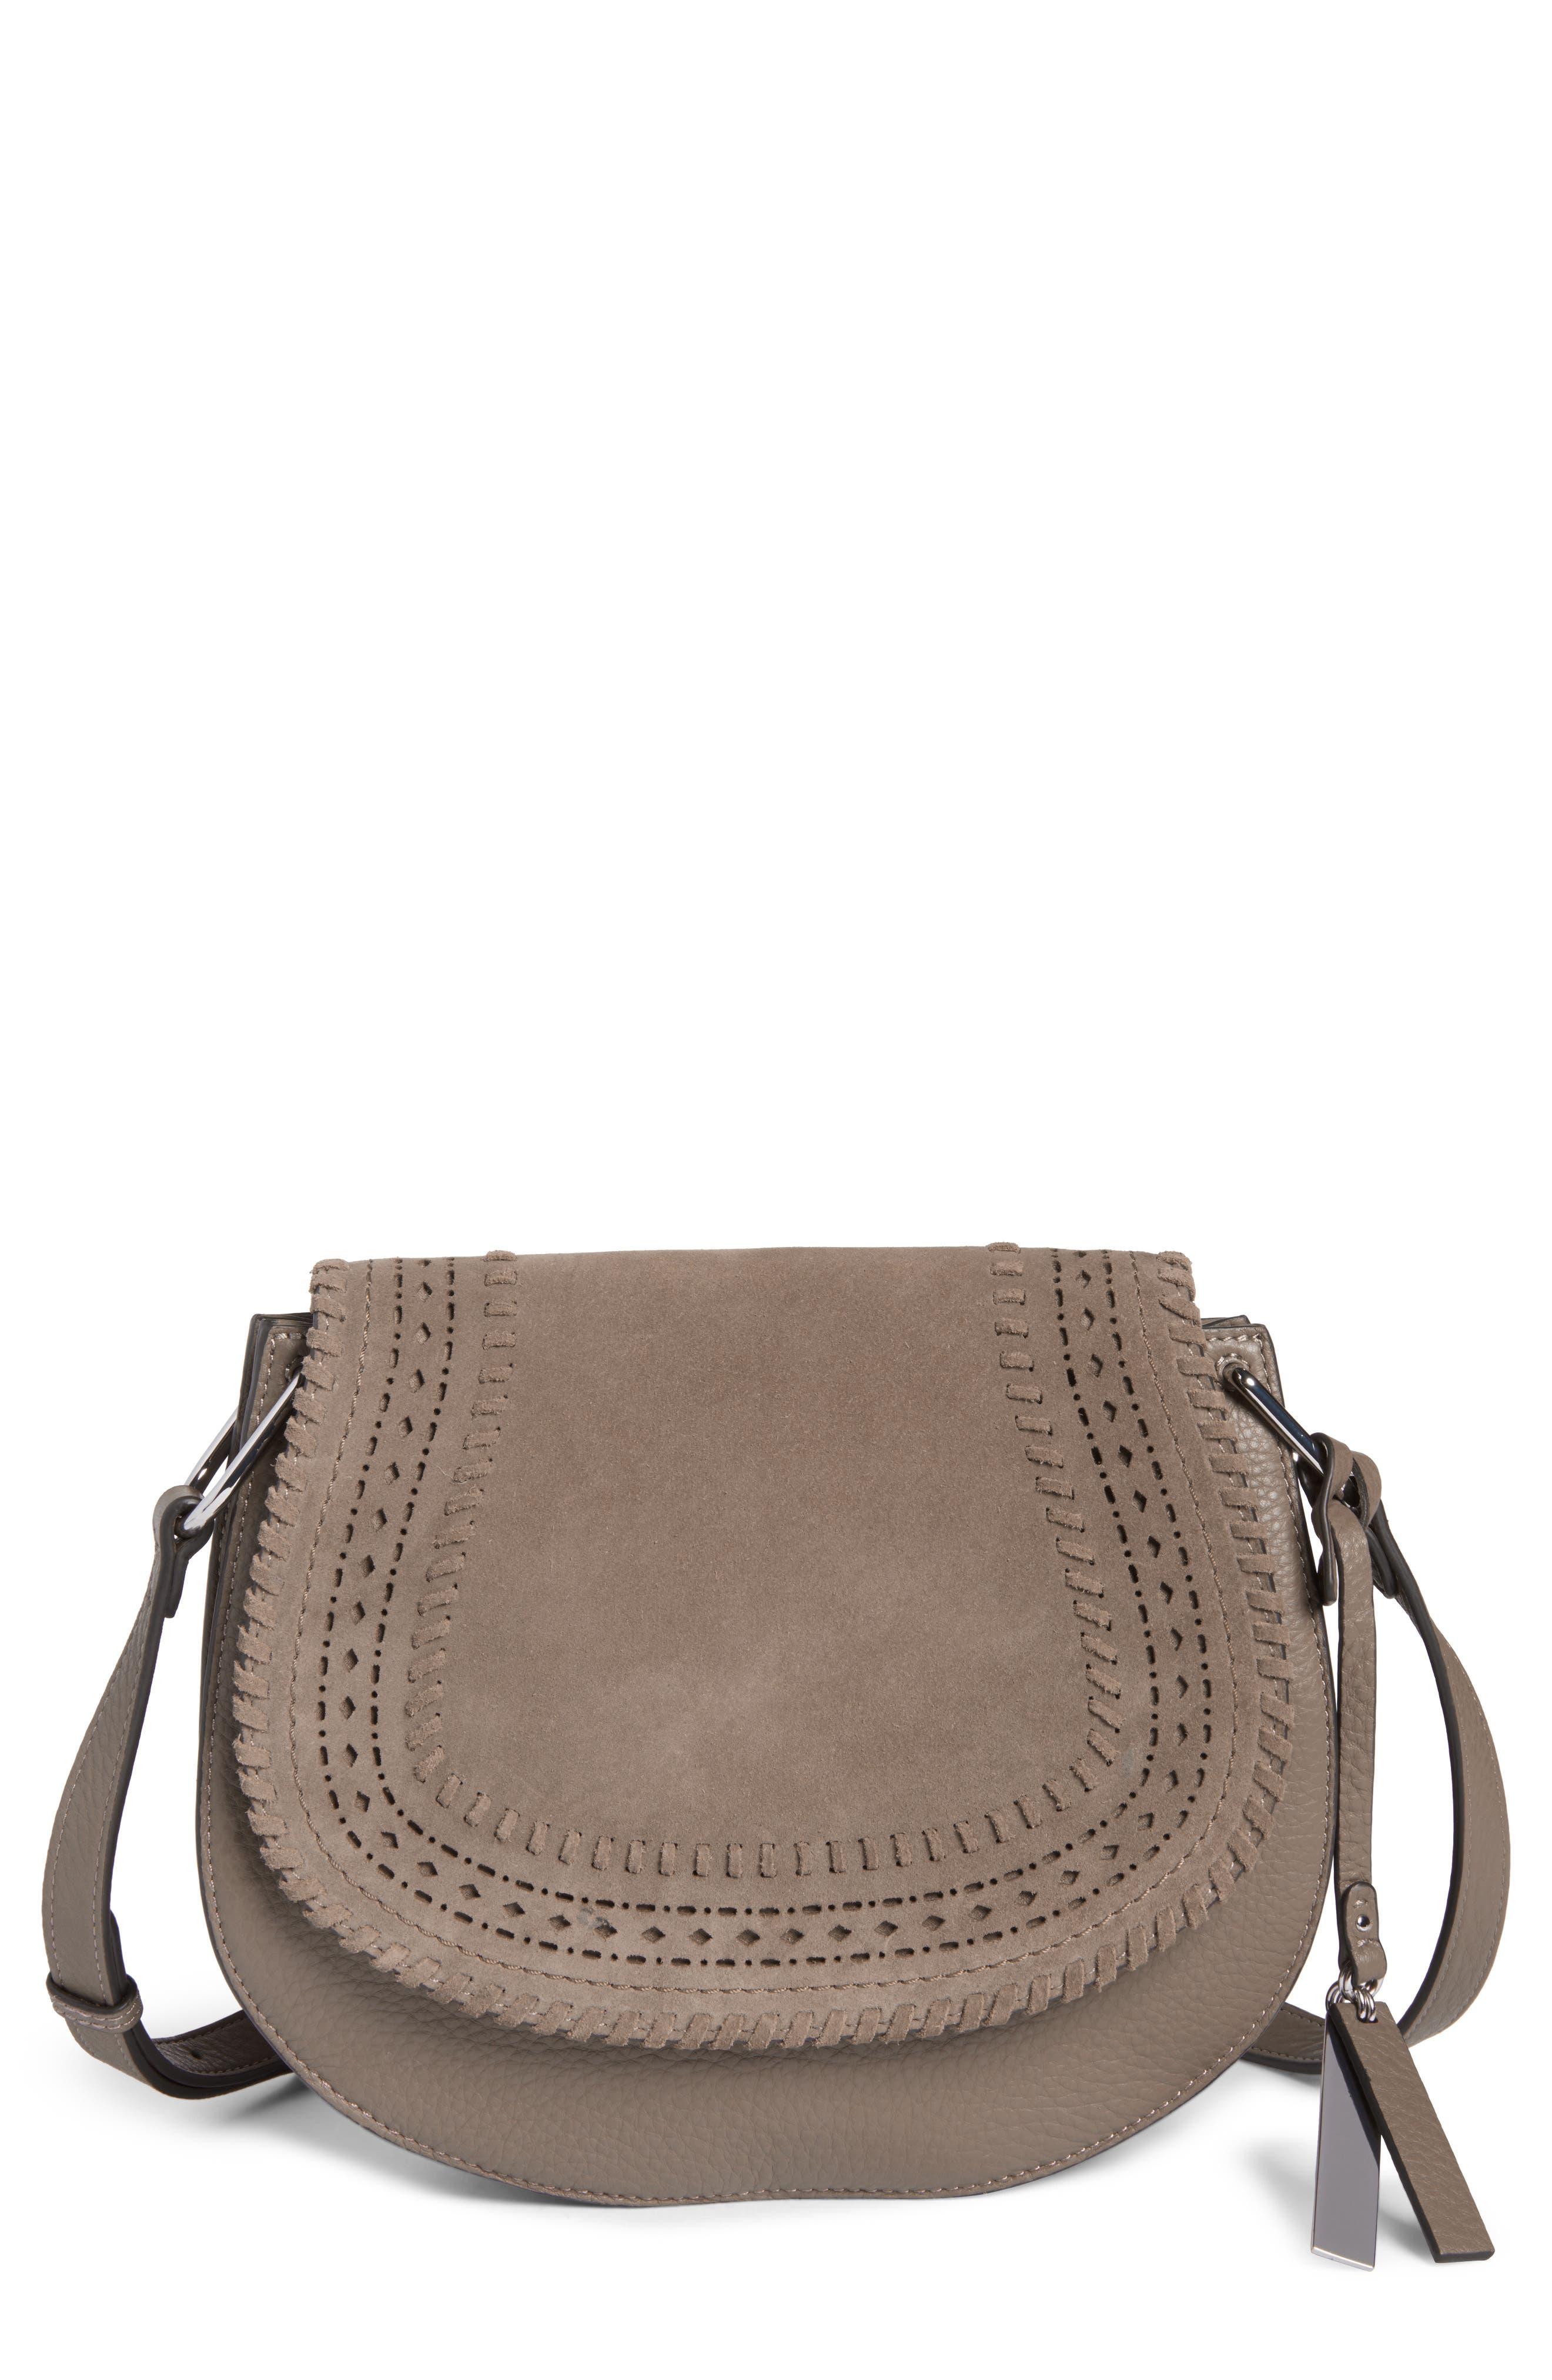 Kirie Suede & Leather Crossbody Saddle Bag,                             Main thumbnail 1, color,                             020